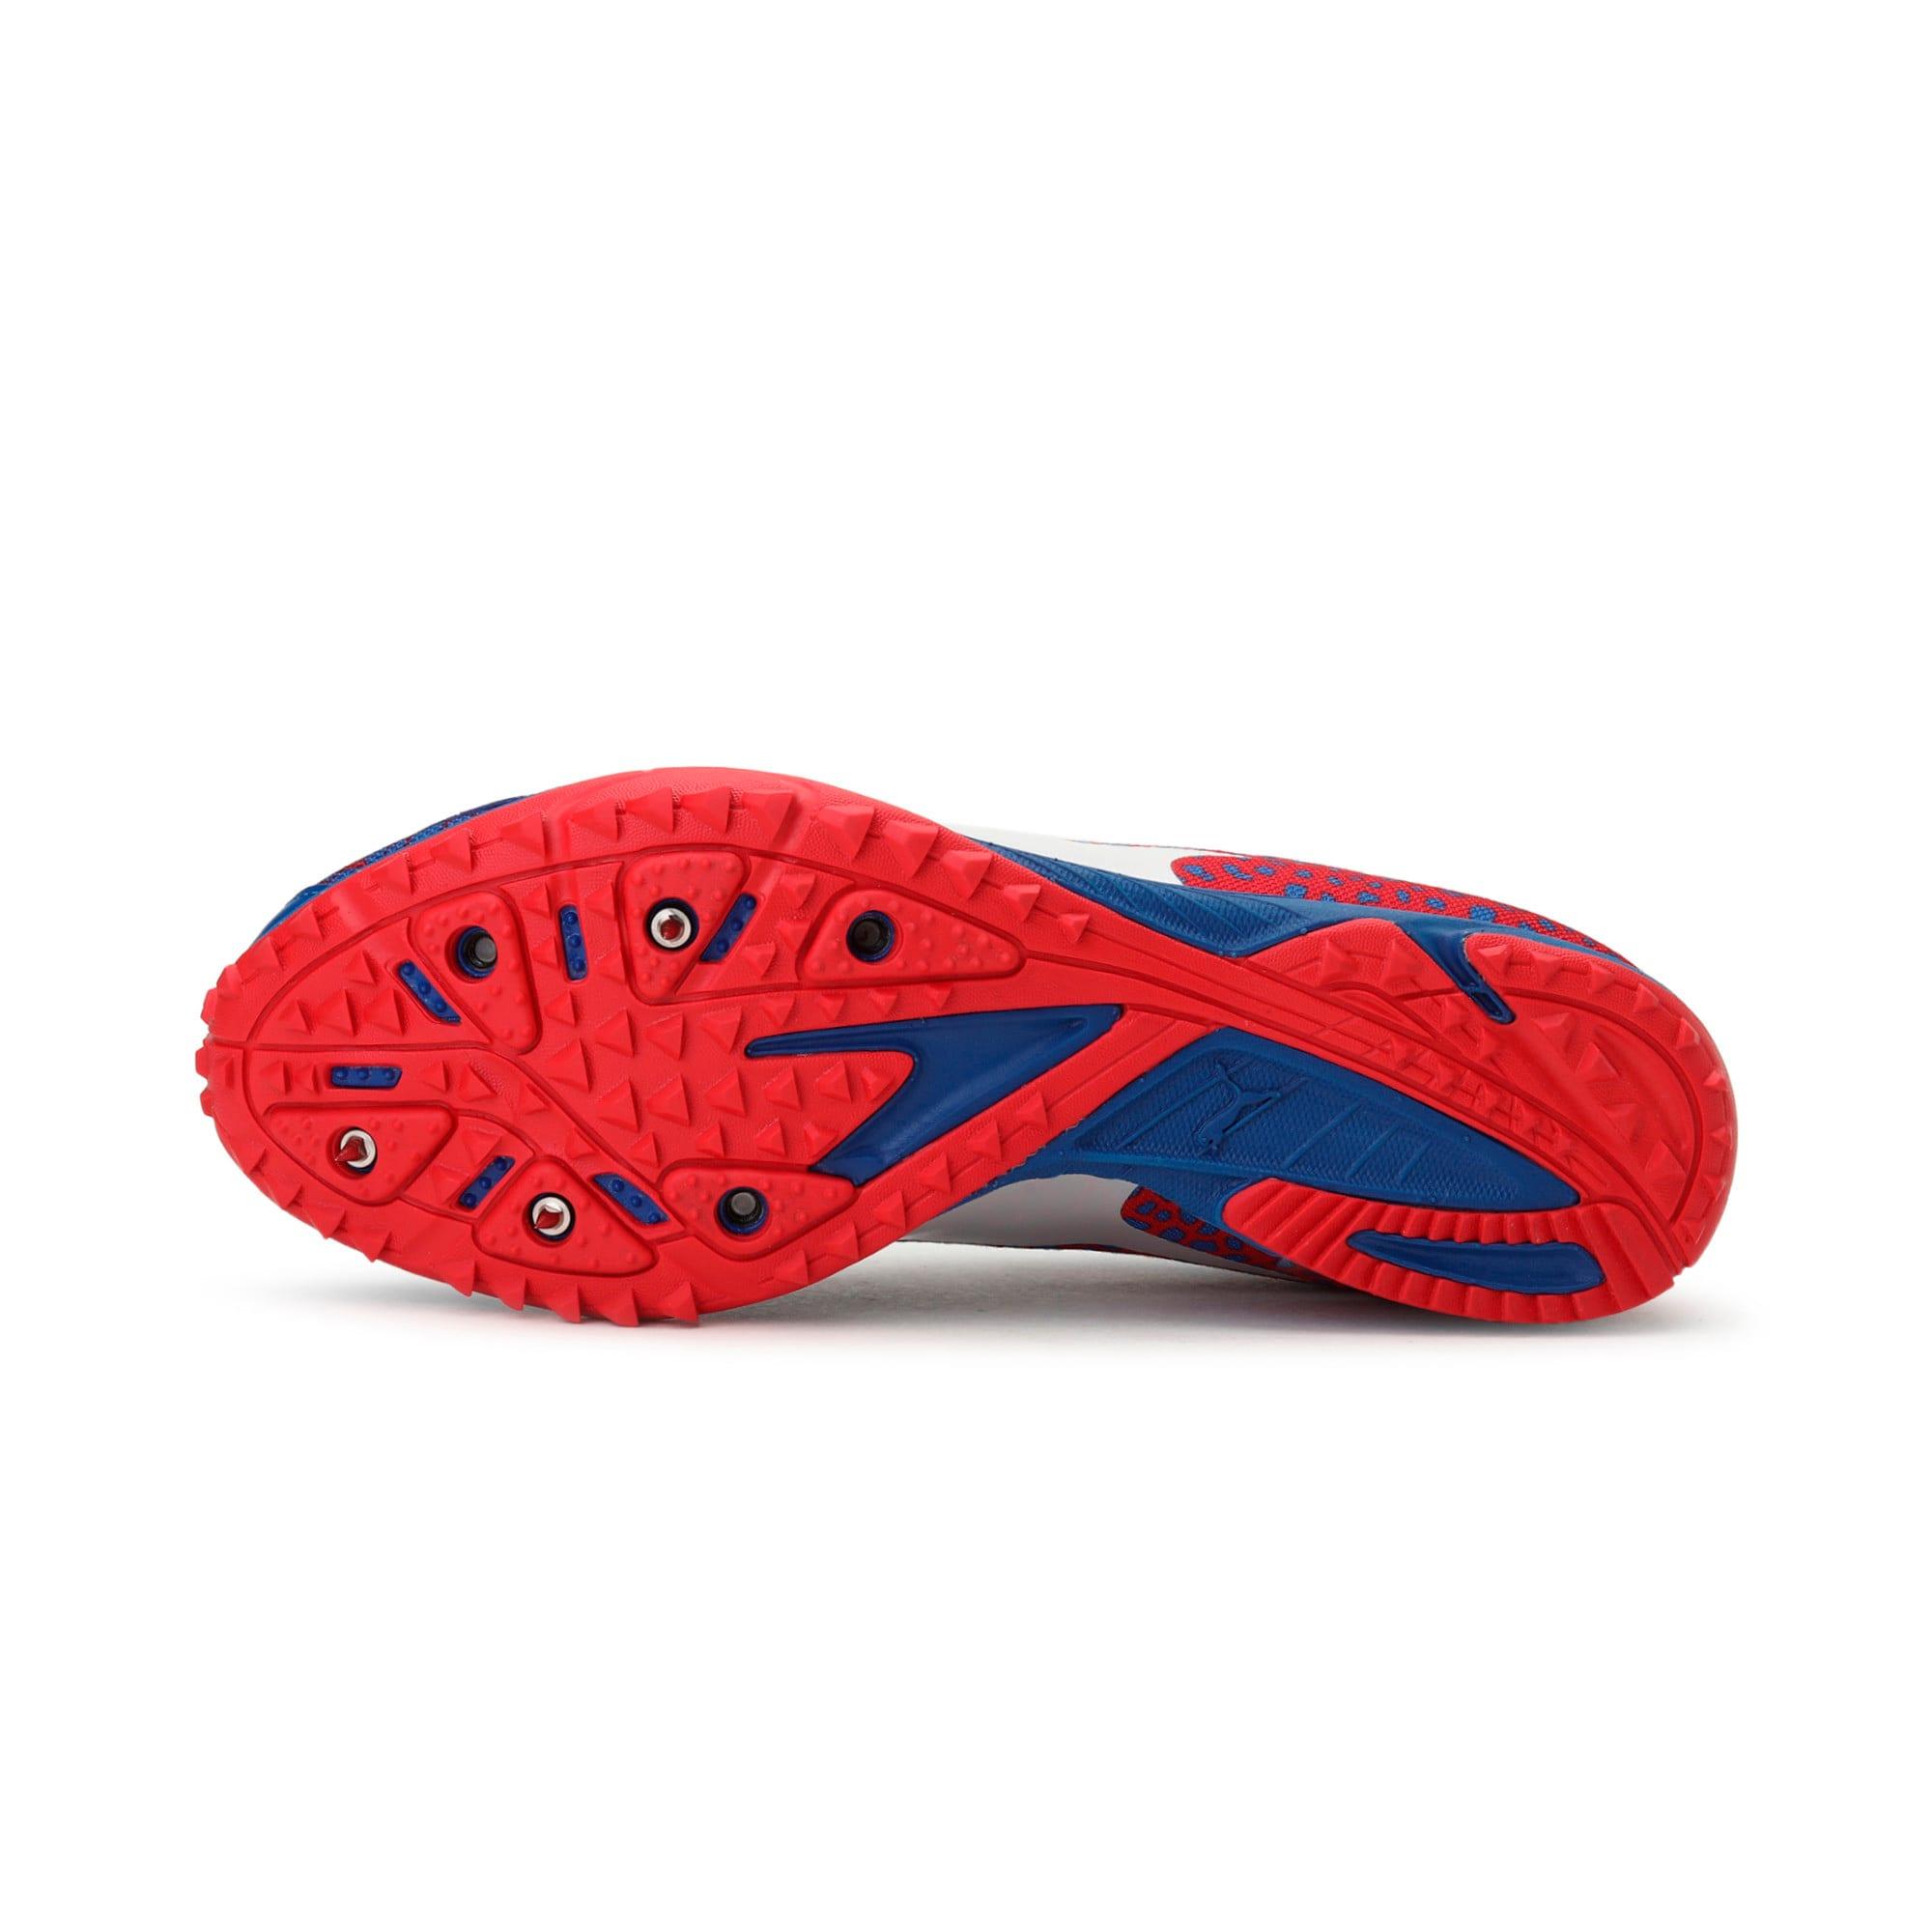 Thumbnail 3 of evoSPEED Haraka 4 Men's Cross Country Running Shoes, Lapis Blue-Toreador, medium-IND